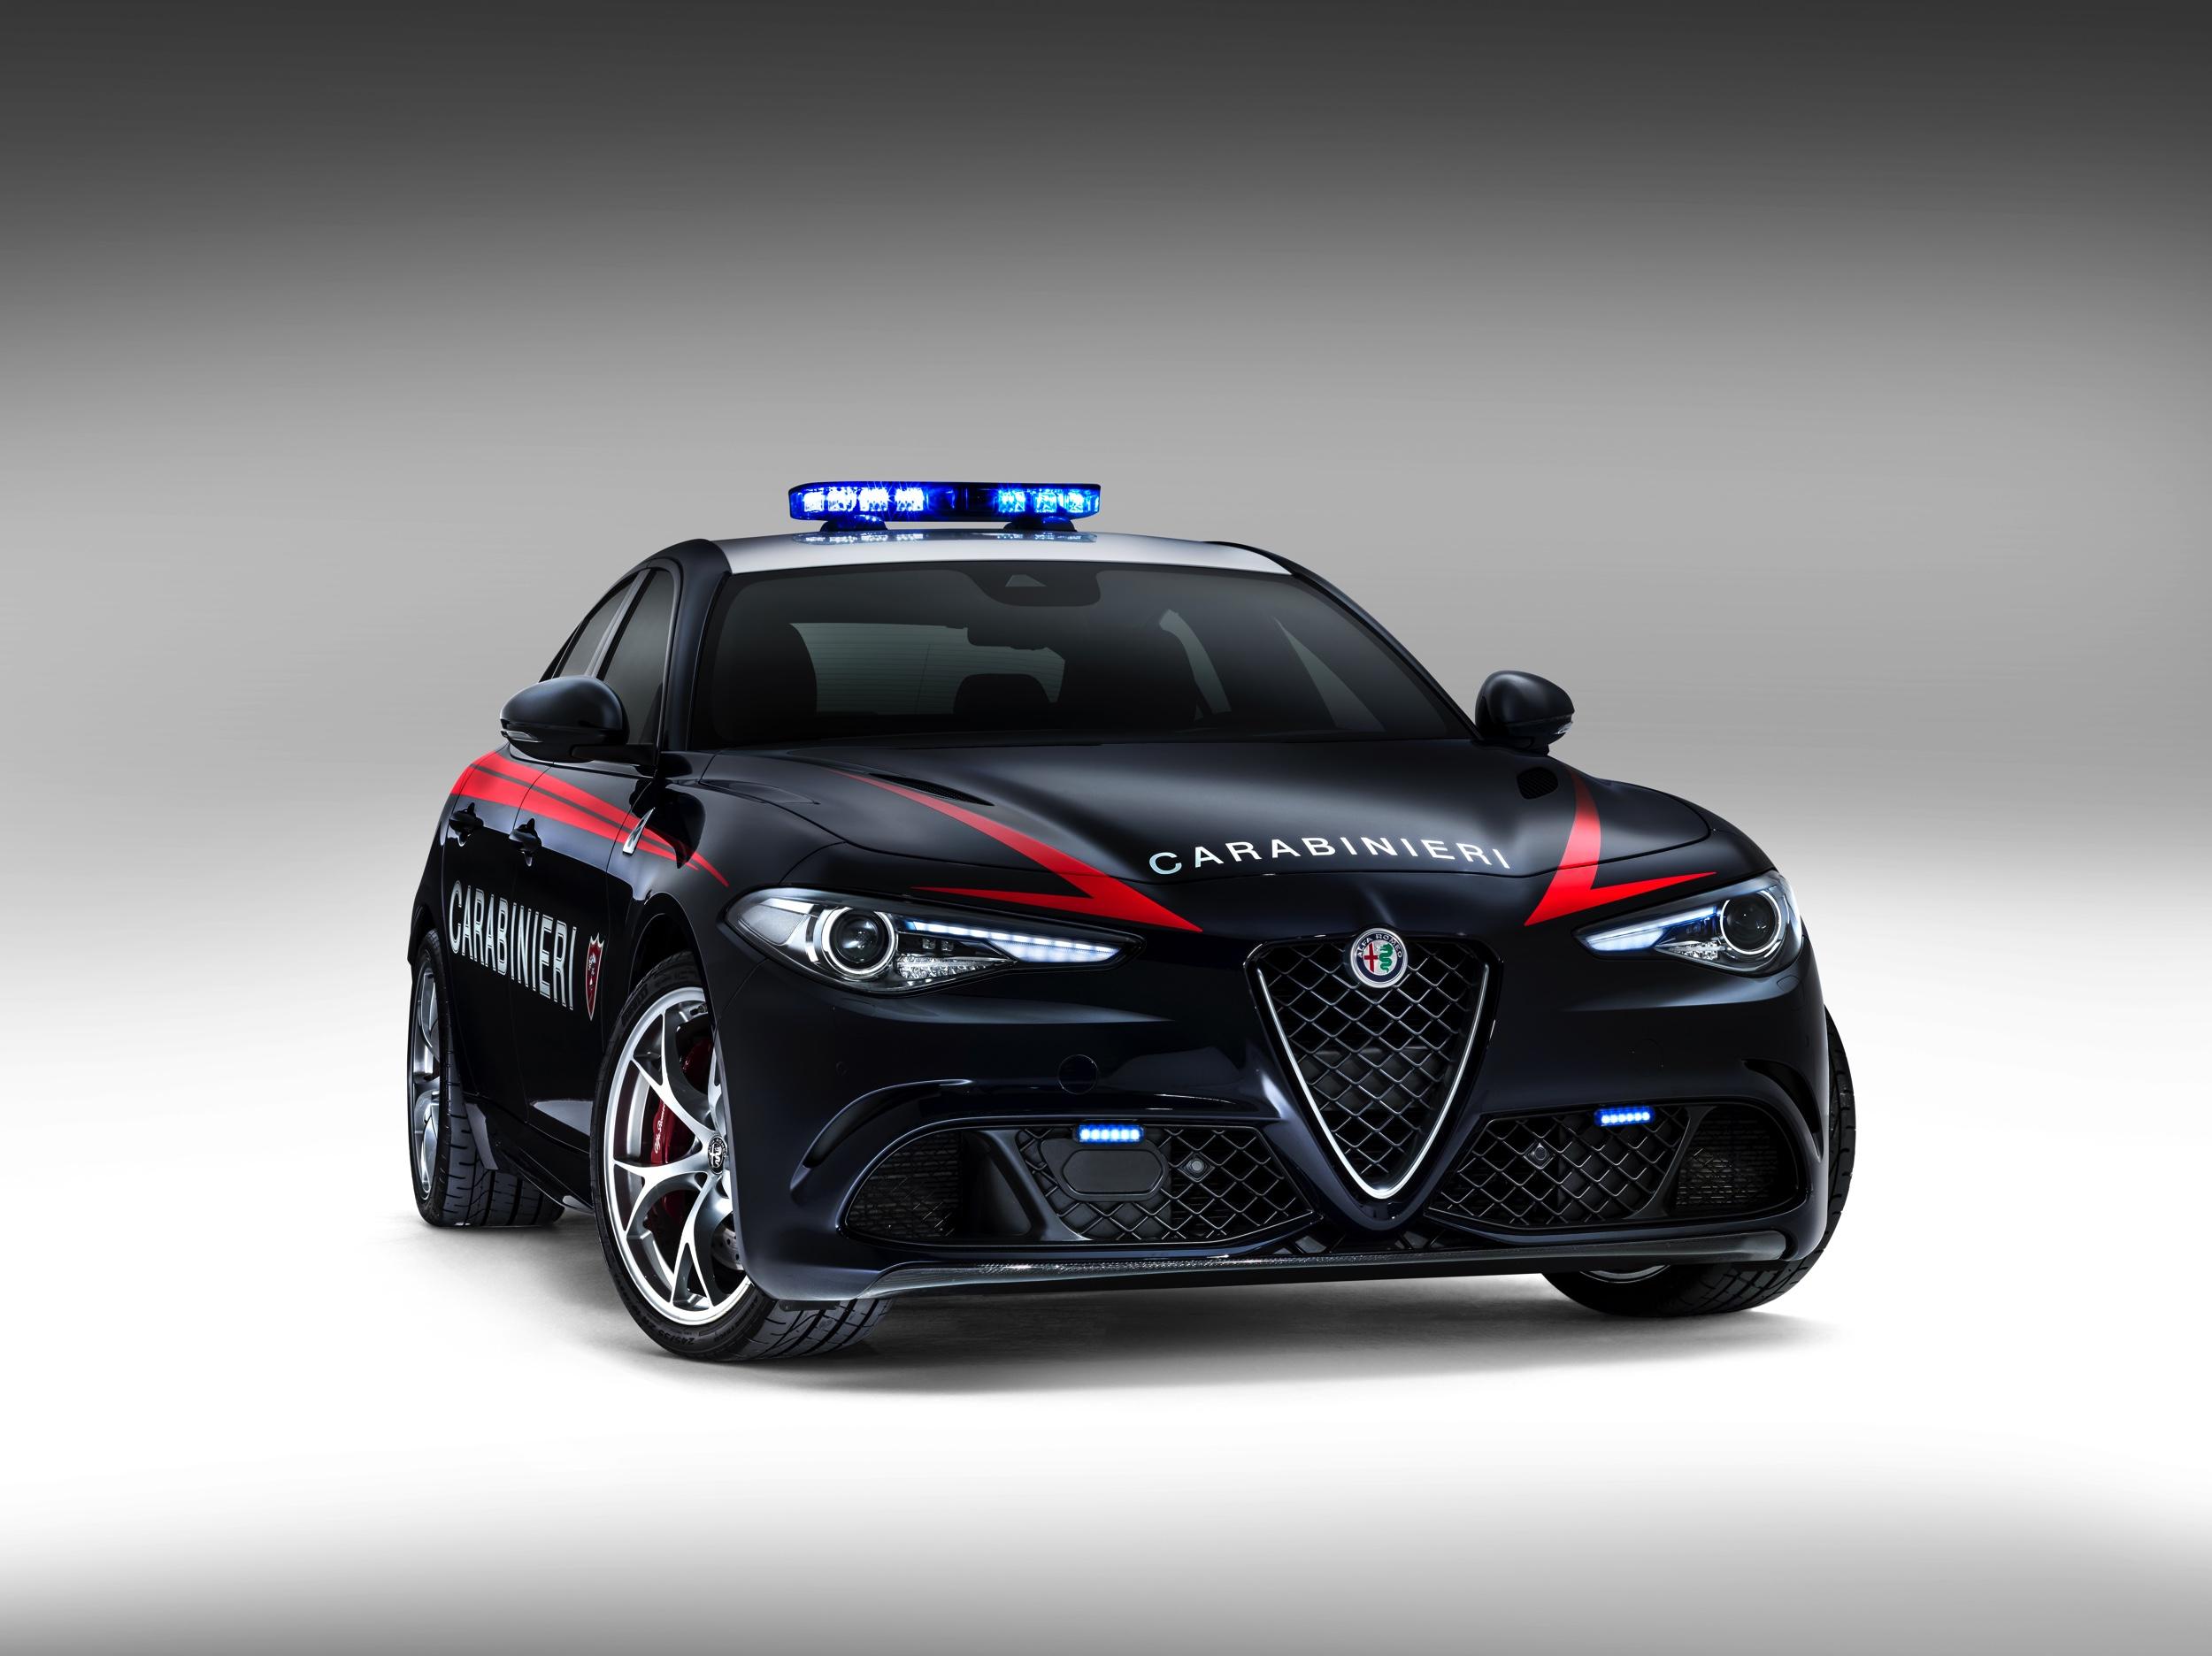 Alfa Romeo Giulia Quadrifoglio Carabinieri -3- Autovisie.nl